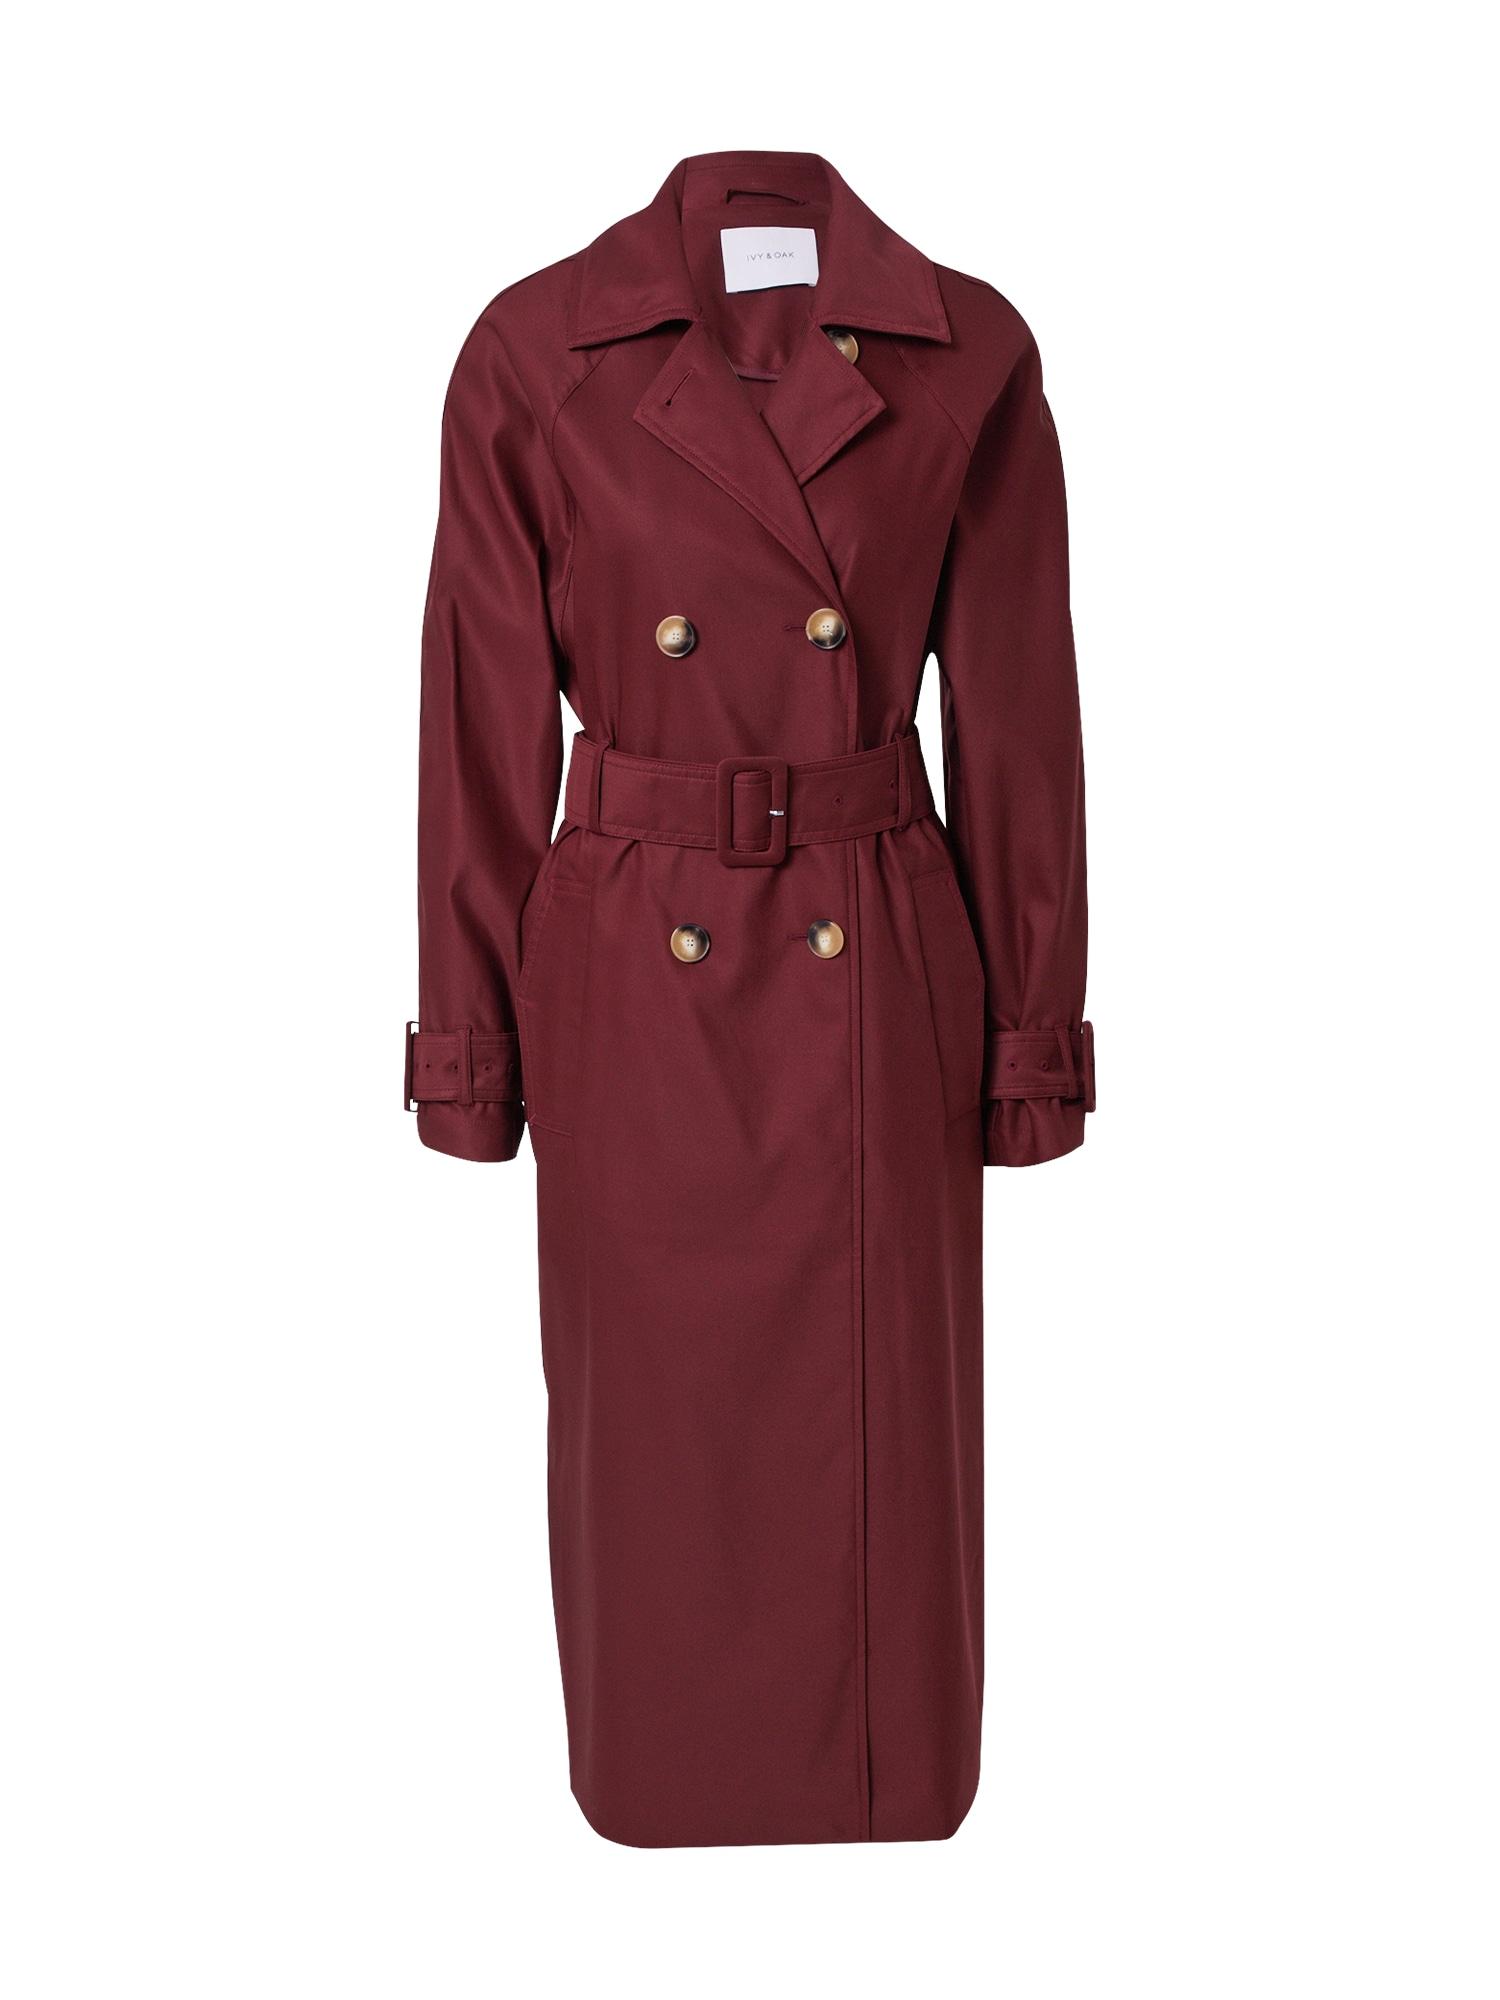 IVY & OAK Demisezoninis paltas vyšninė spalva